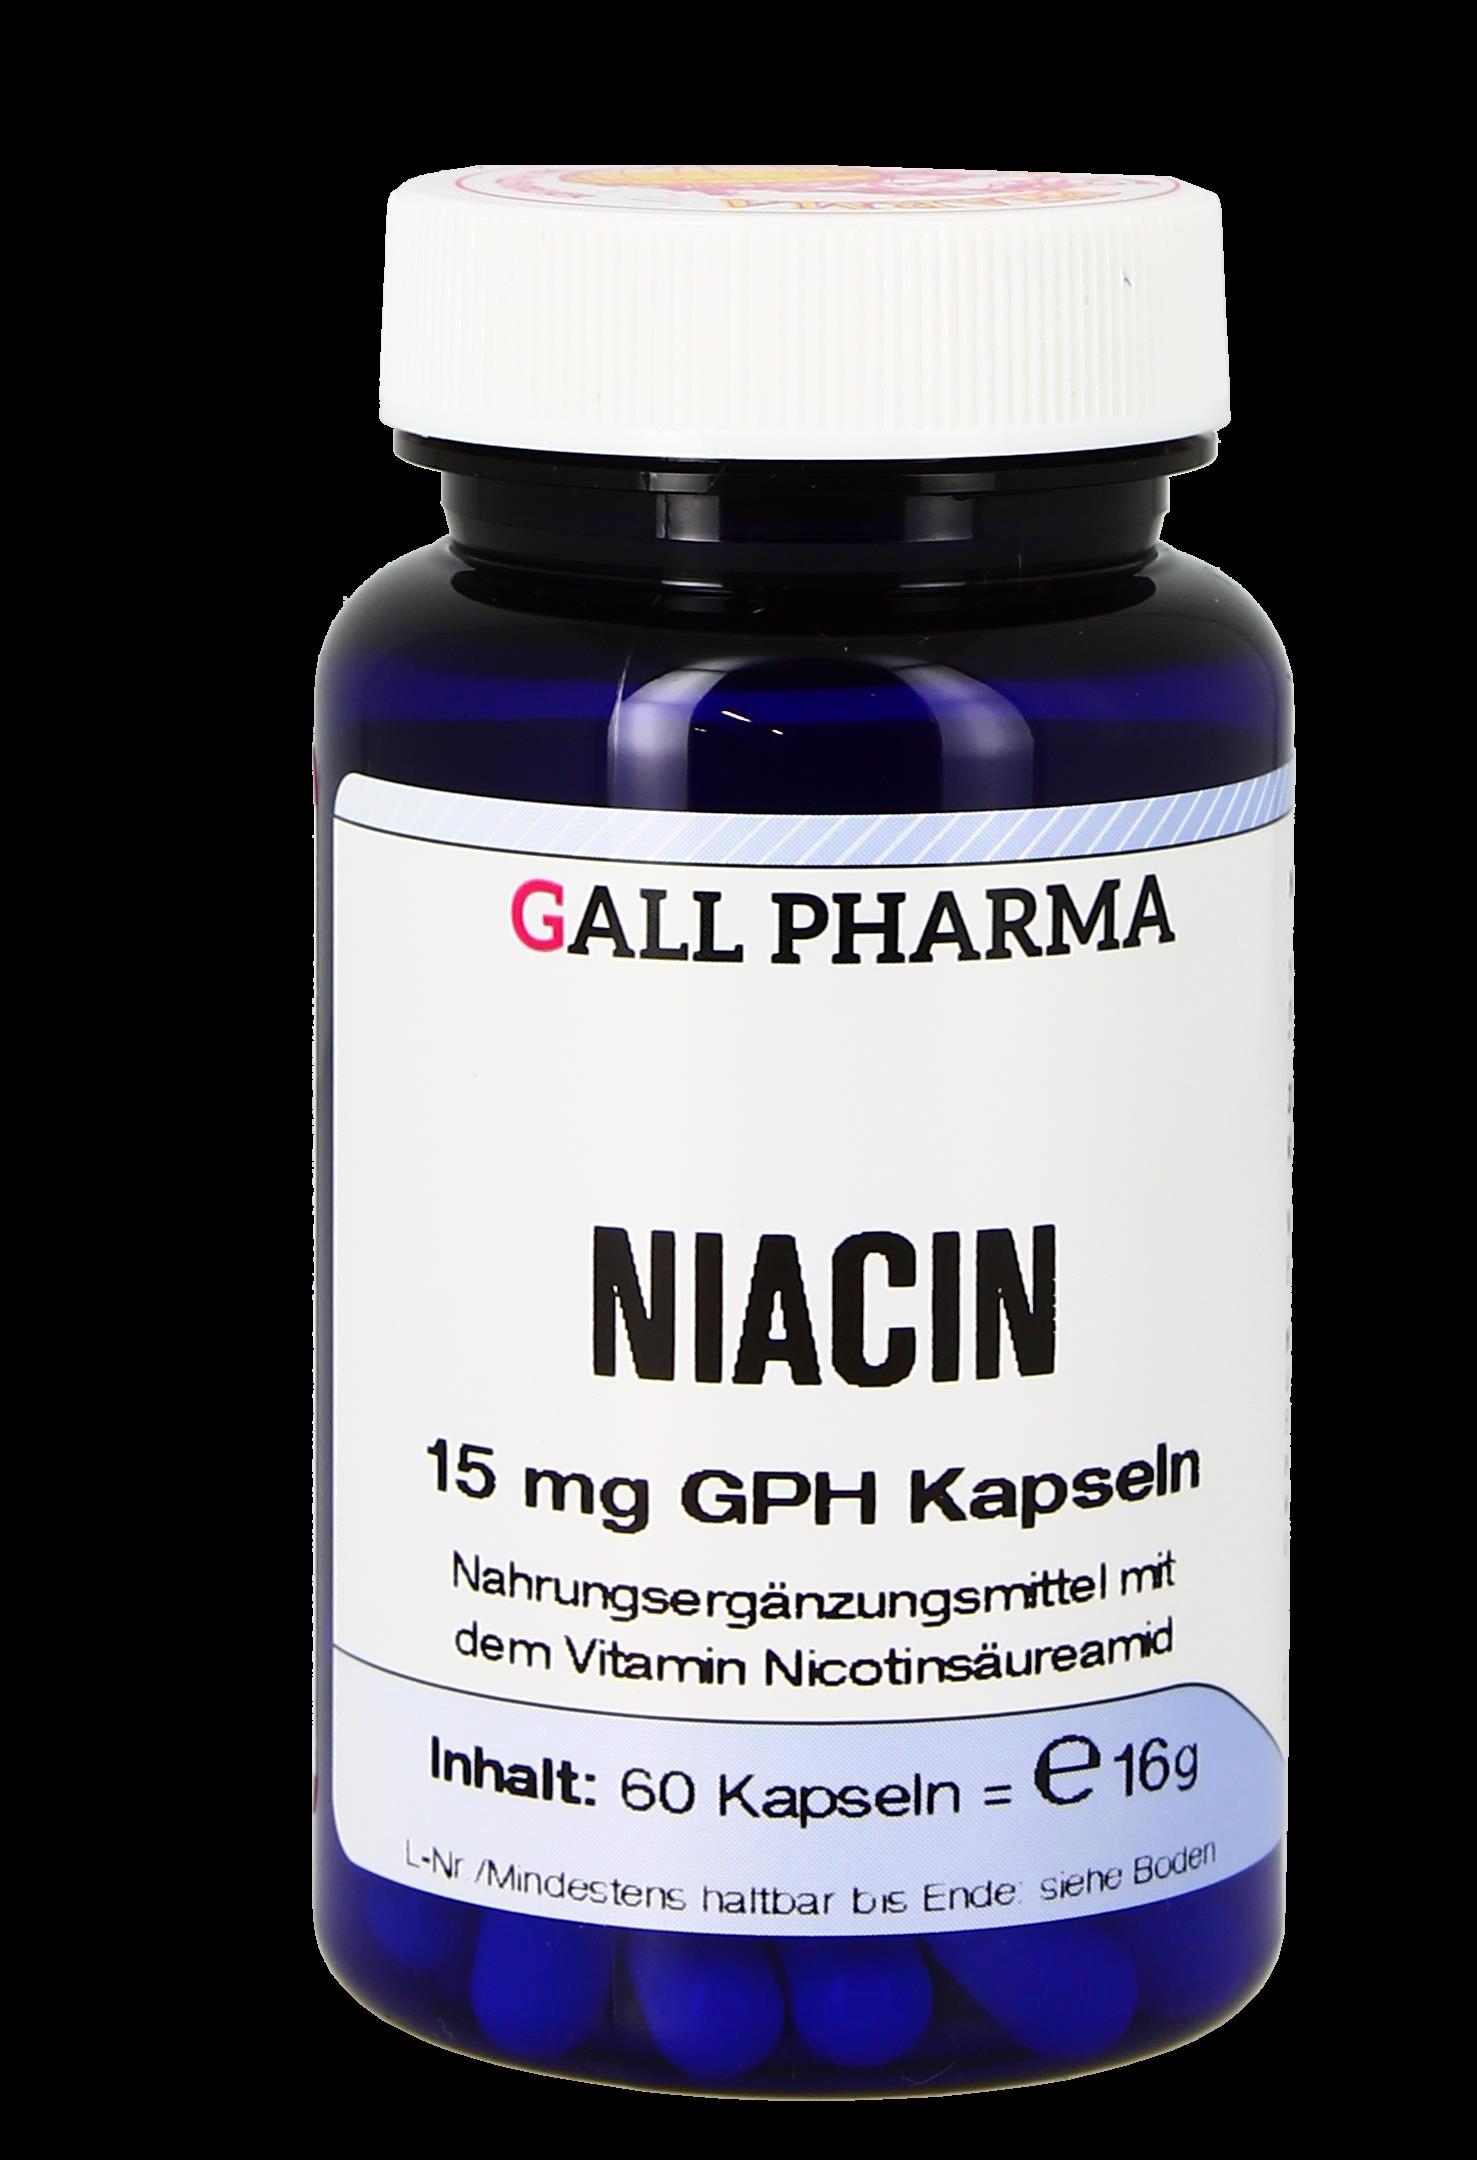 Niacin 100 mg GPH Kapseln